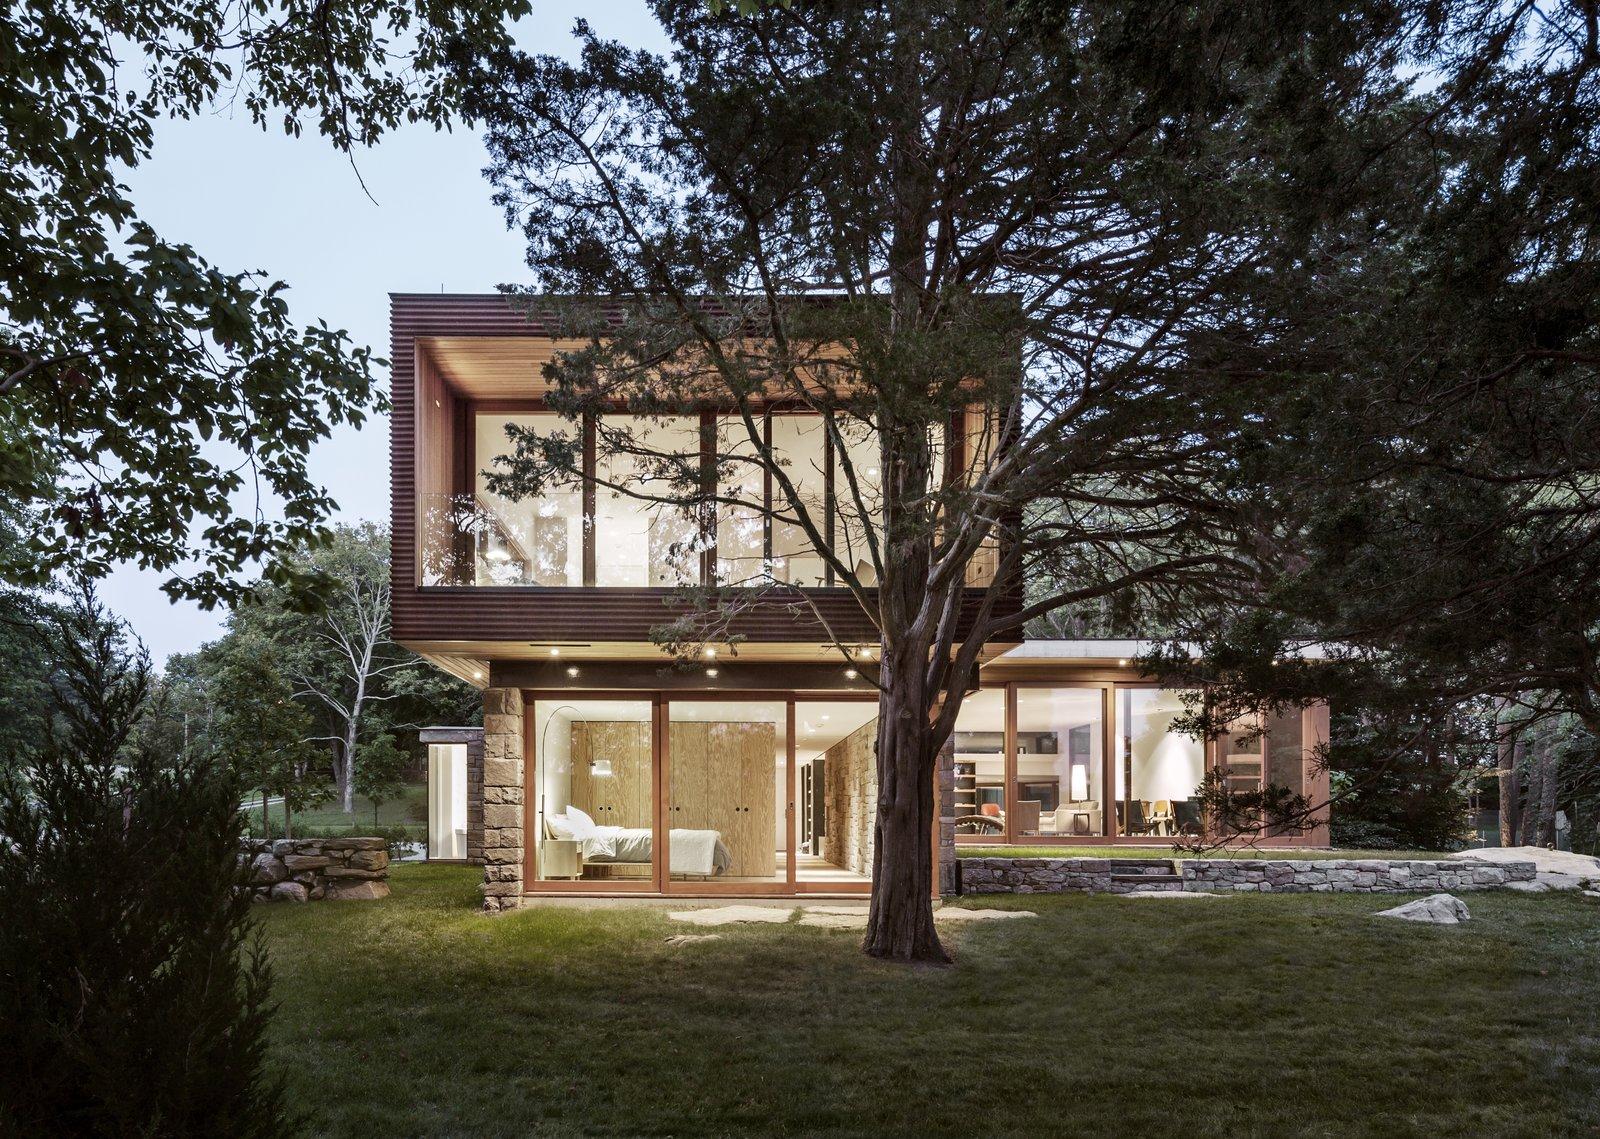 Exterior, House Building Type, Metal Roof Material, Wood Siding Material, Metal Siding Material, and Flat RoofLine  Best Photos